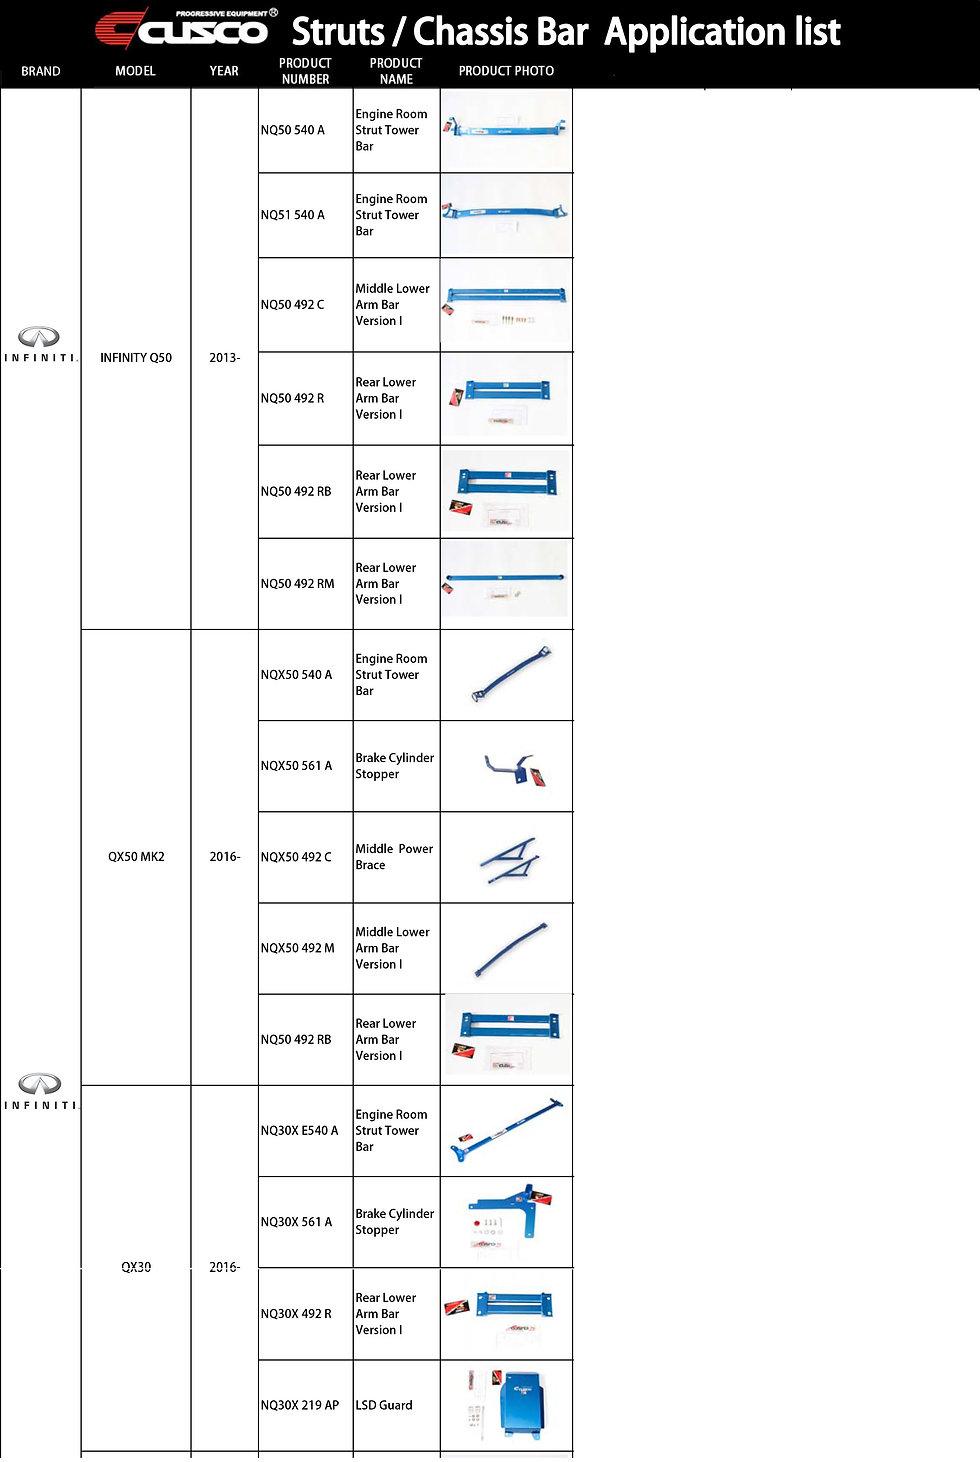 CUSCO-infinite-application-list.jpg